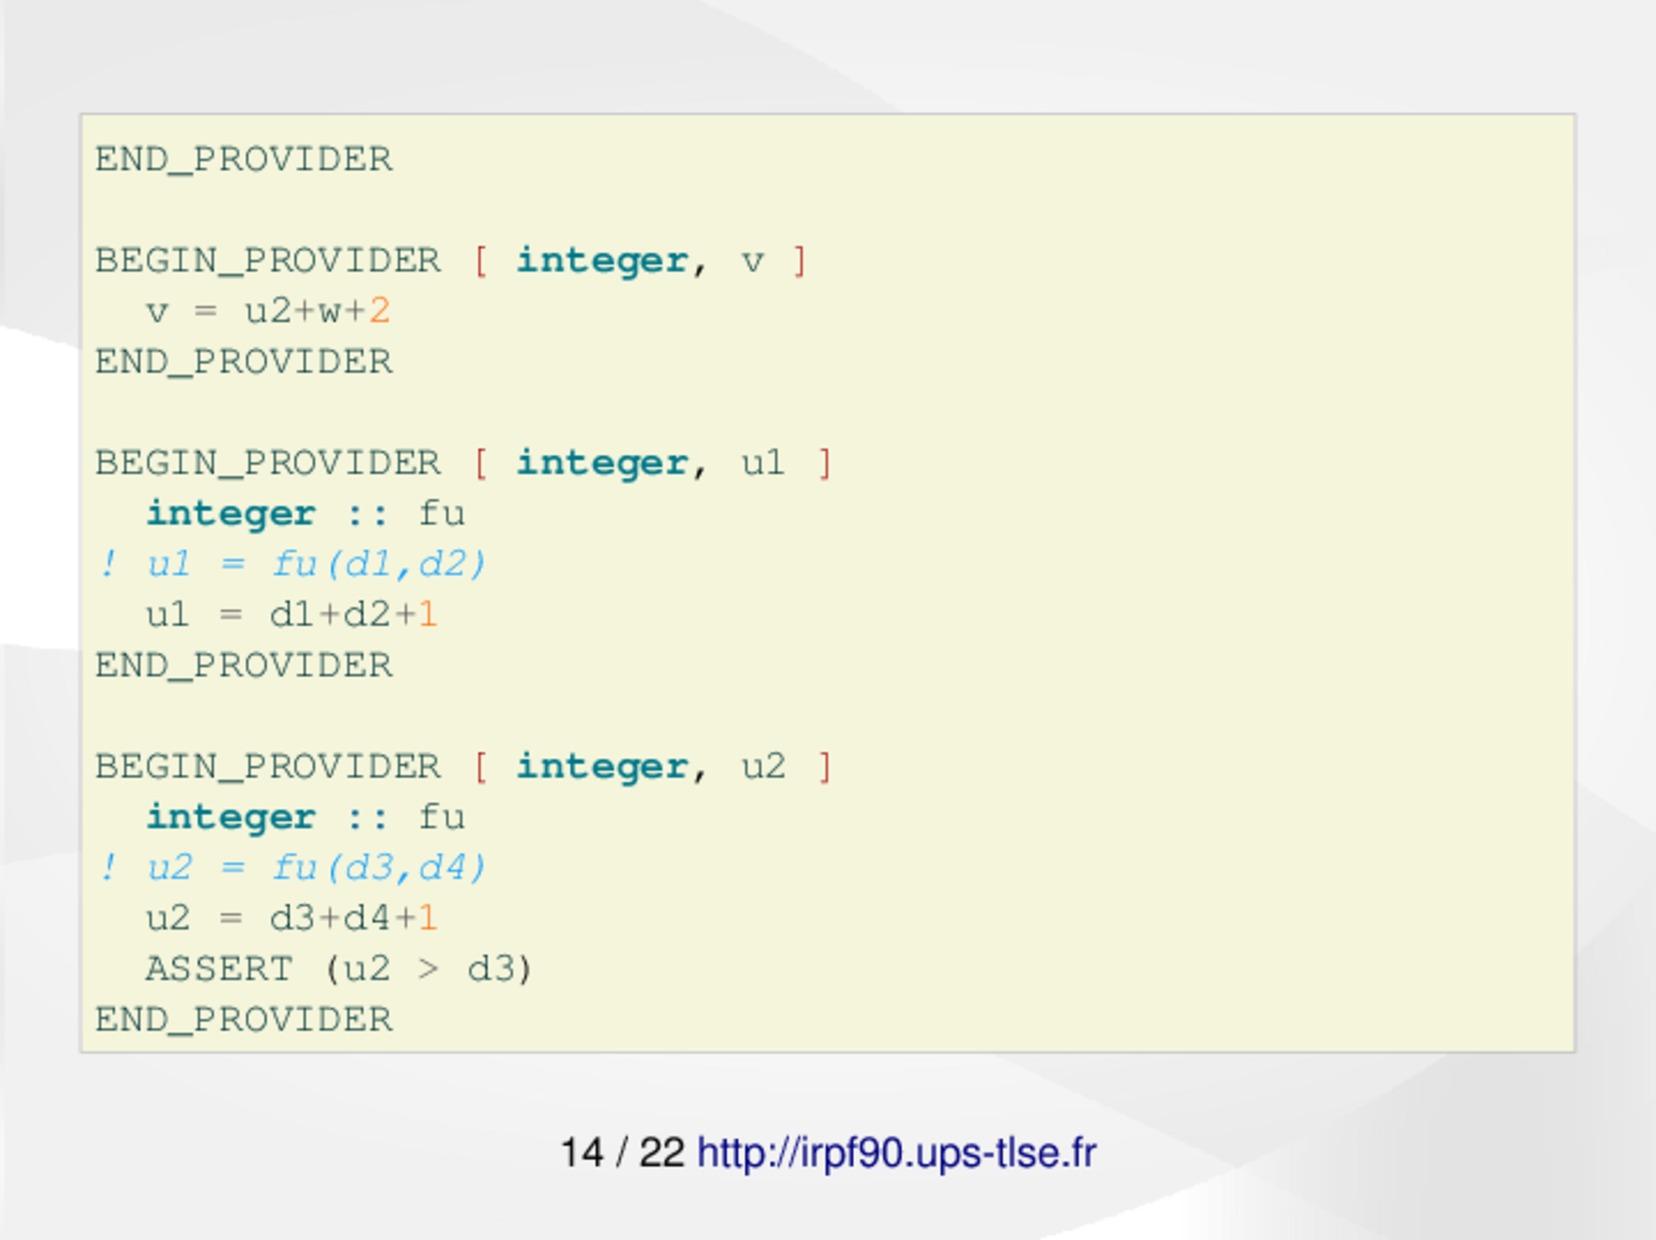 IRPF90 : a Fortran code generator for HPC